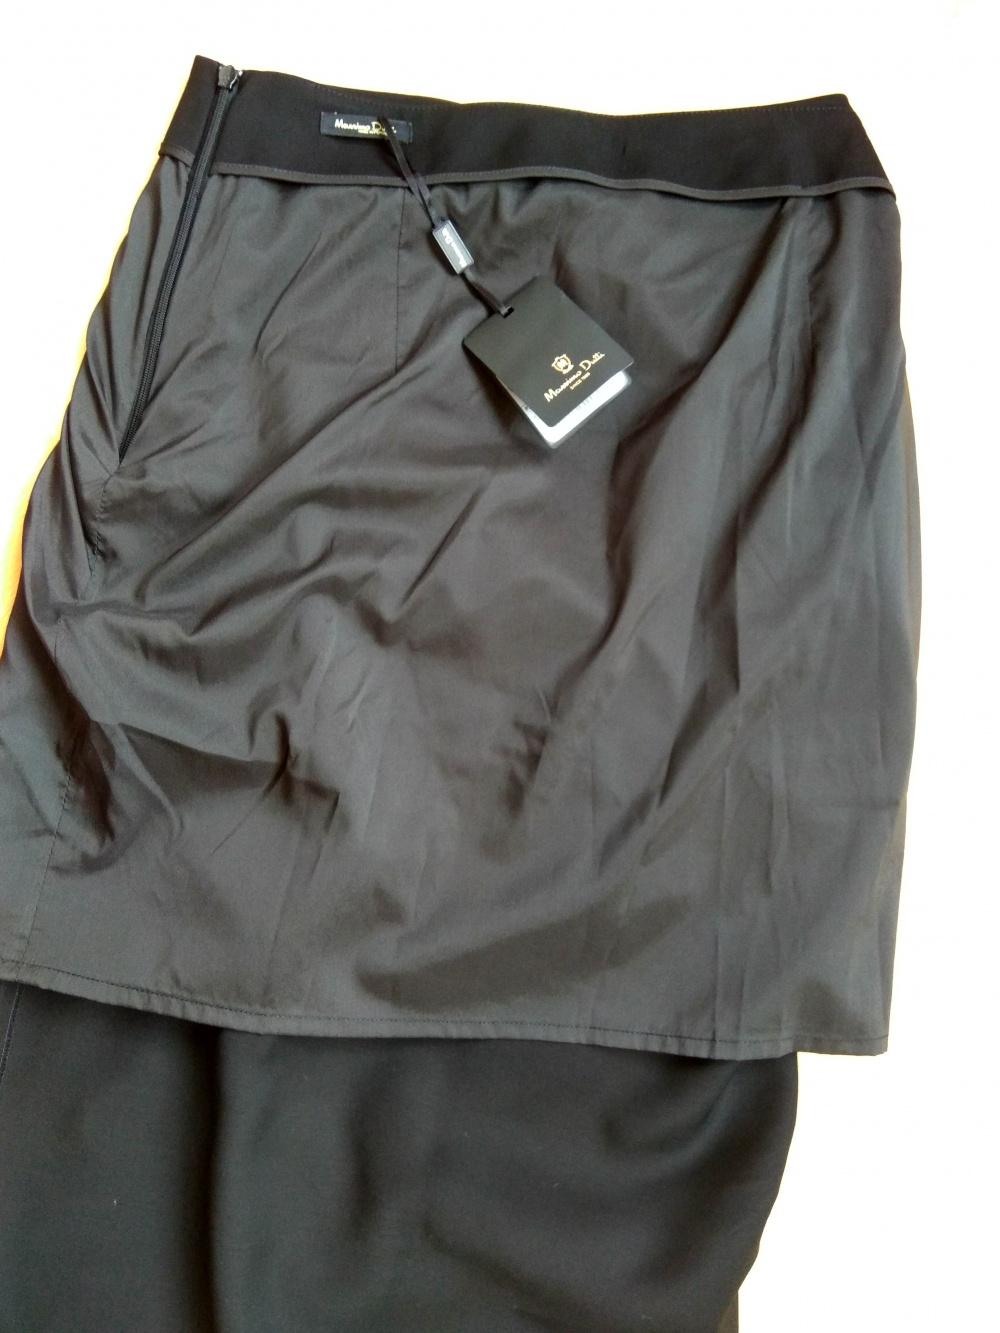 Massimo Dutti юбка новая разм. UK 10 / EUR 38